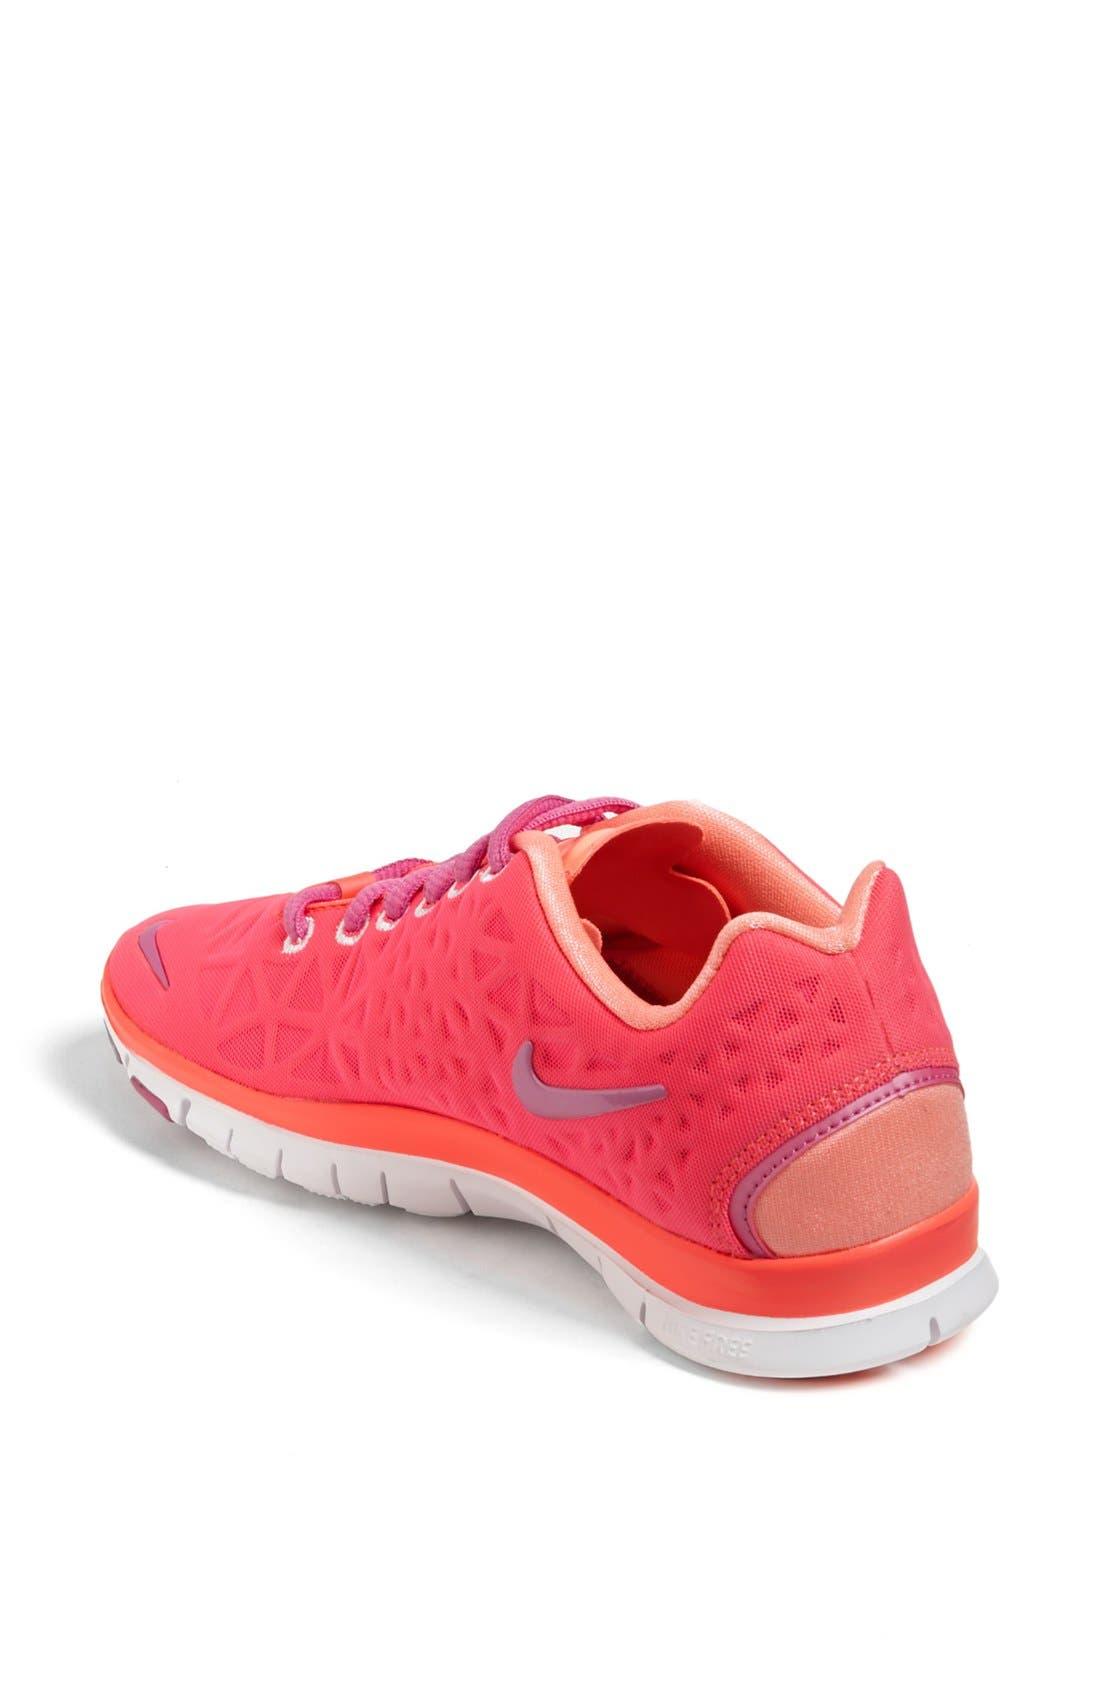 Alternate Image 2  - Nike 'Free TR Fit 3' Training Shoe (Women)